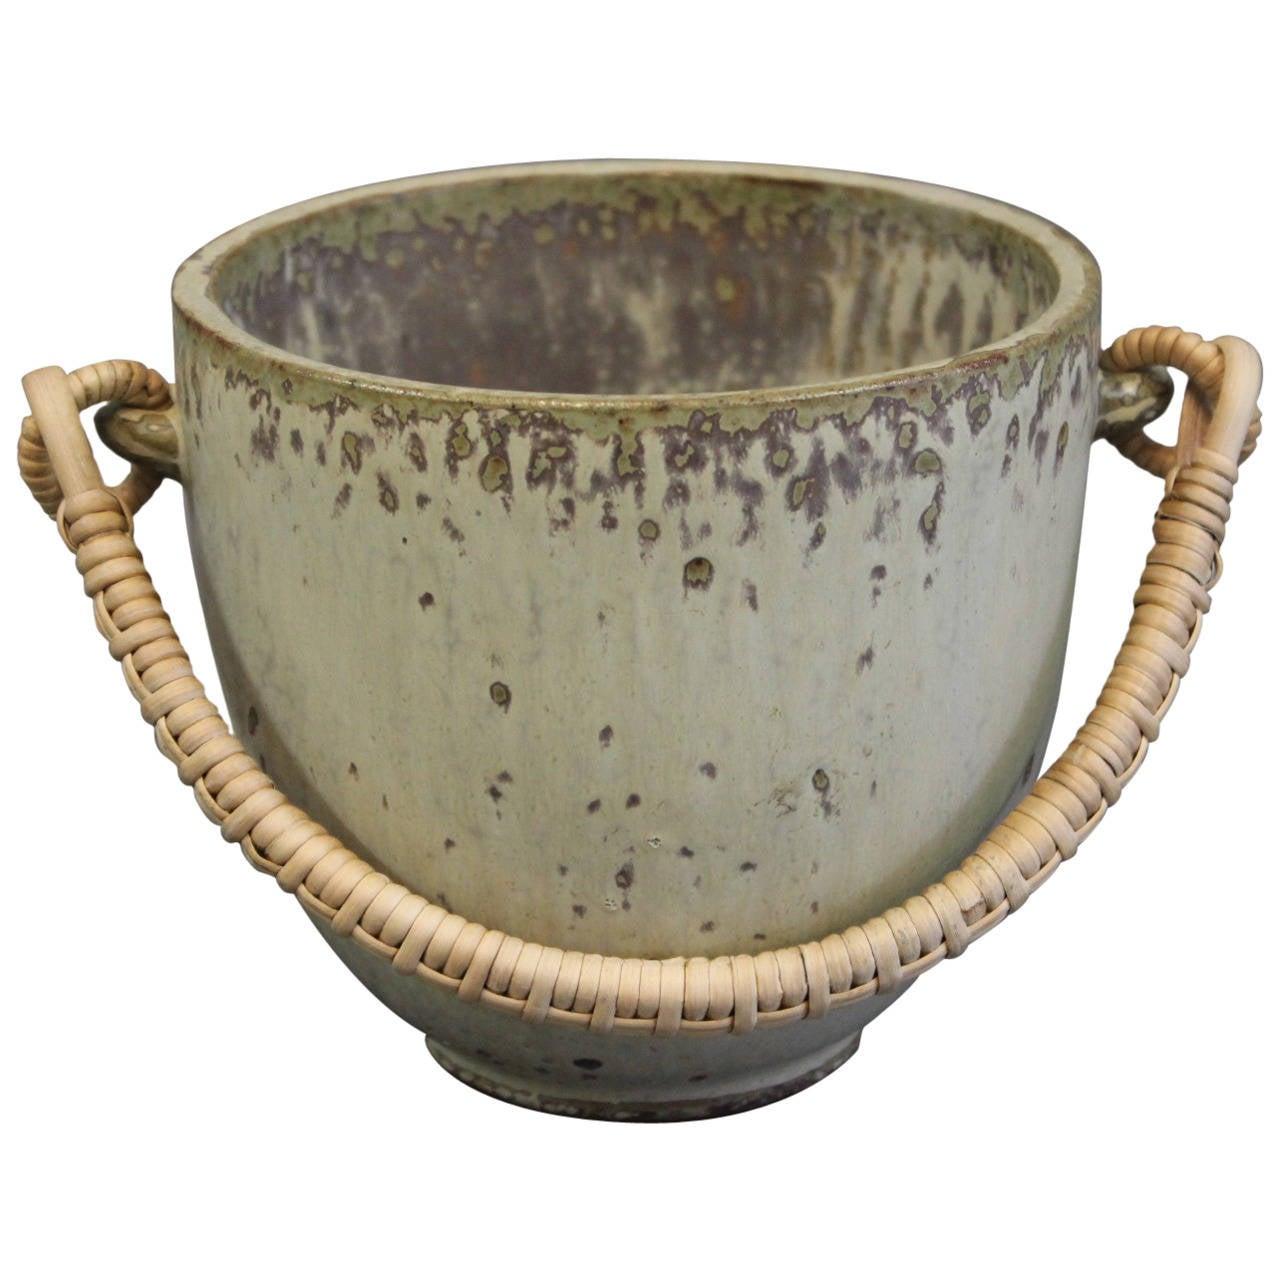 Jar By Arne Bang no. 15 in Glazed Stoneware, c. 1940-1960